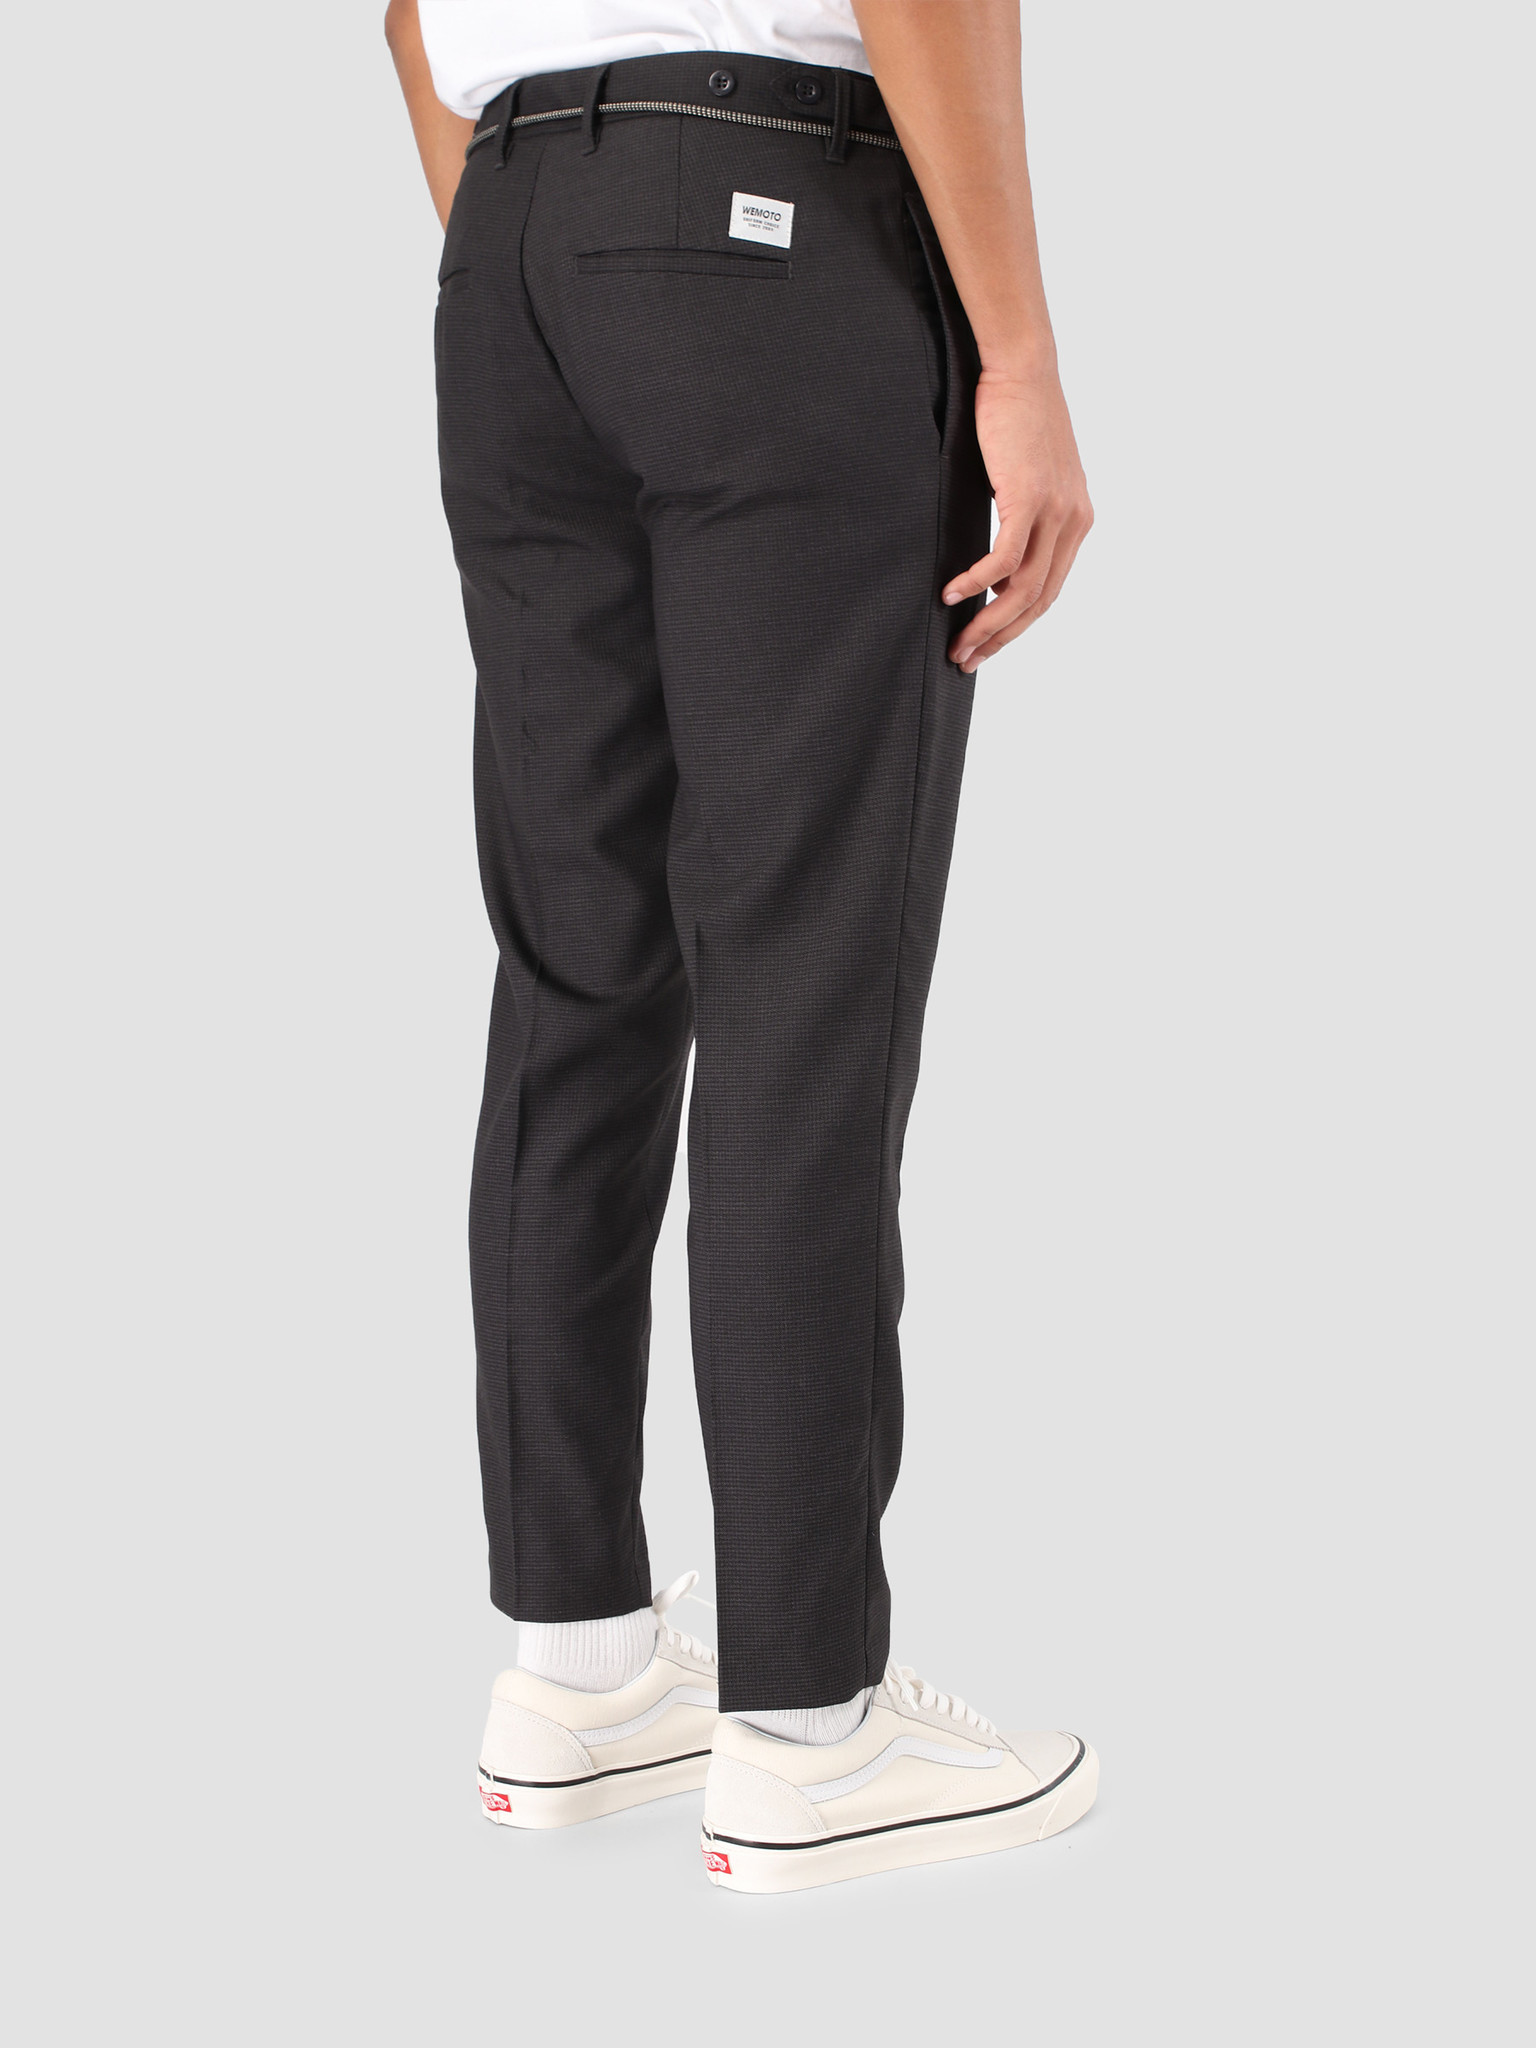 Wemoto Wemoto Daniel Pants Dark Grey Melange 131.704-312